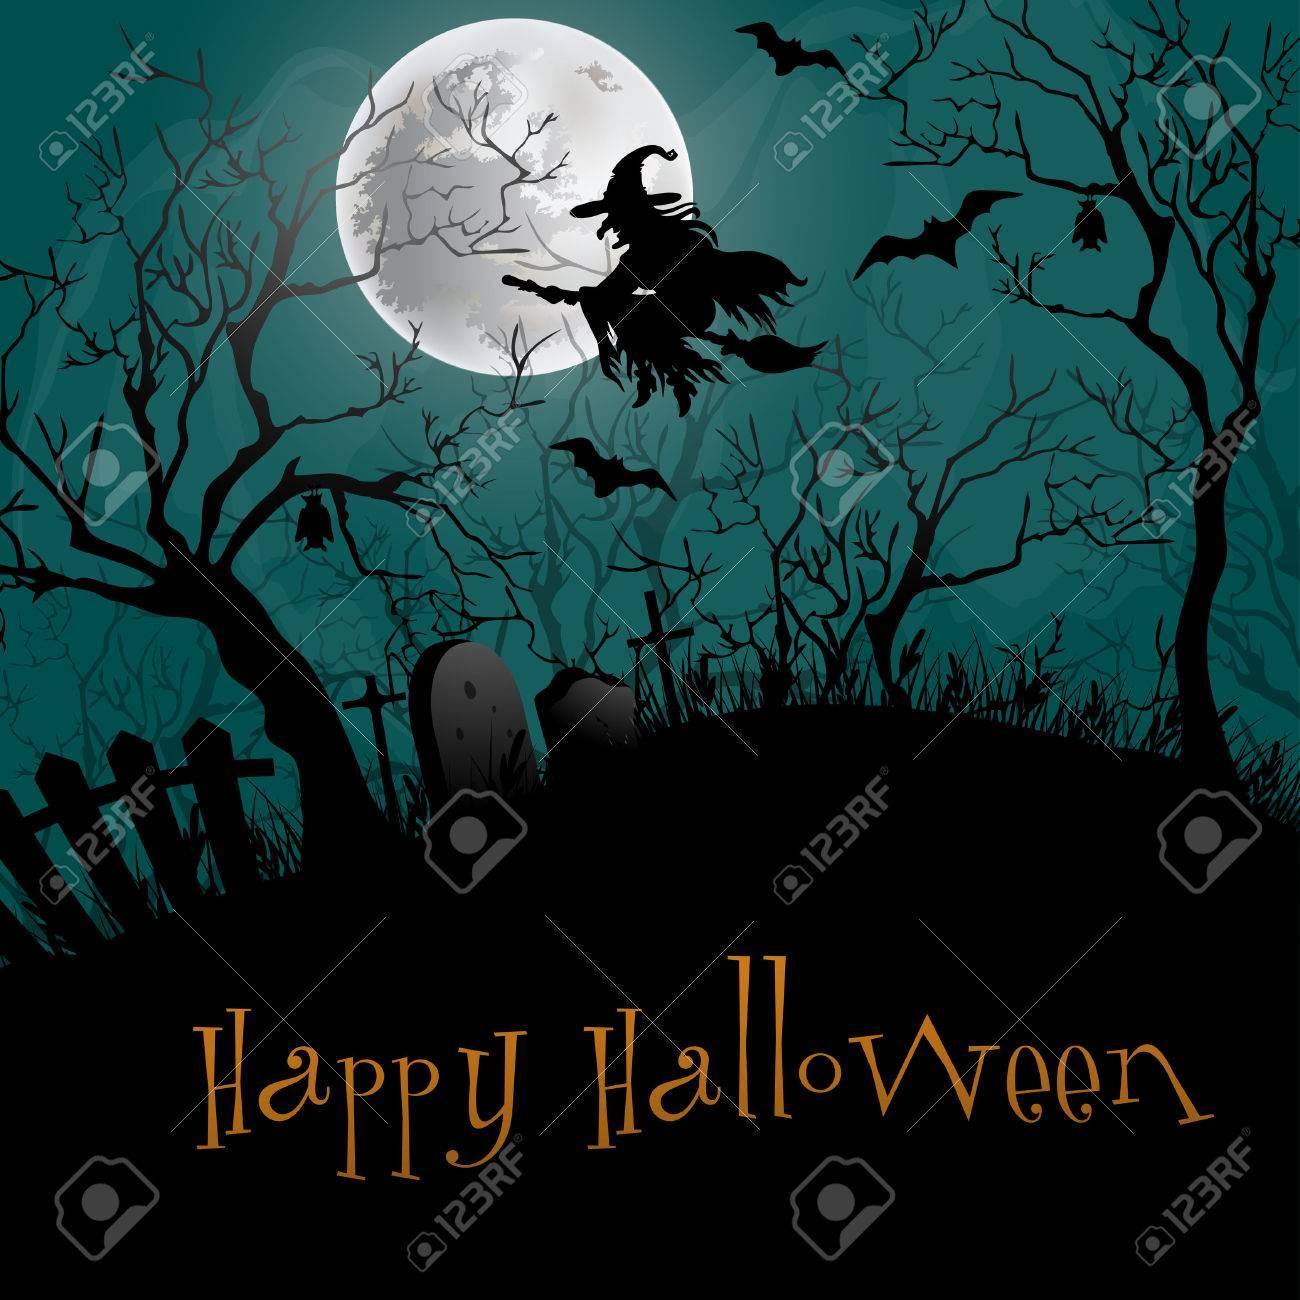 Happy Halloween Background. - 31360147